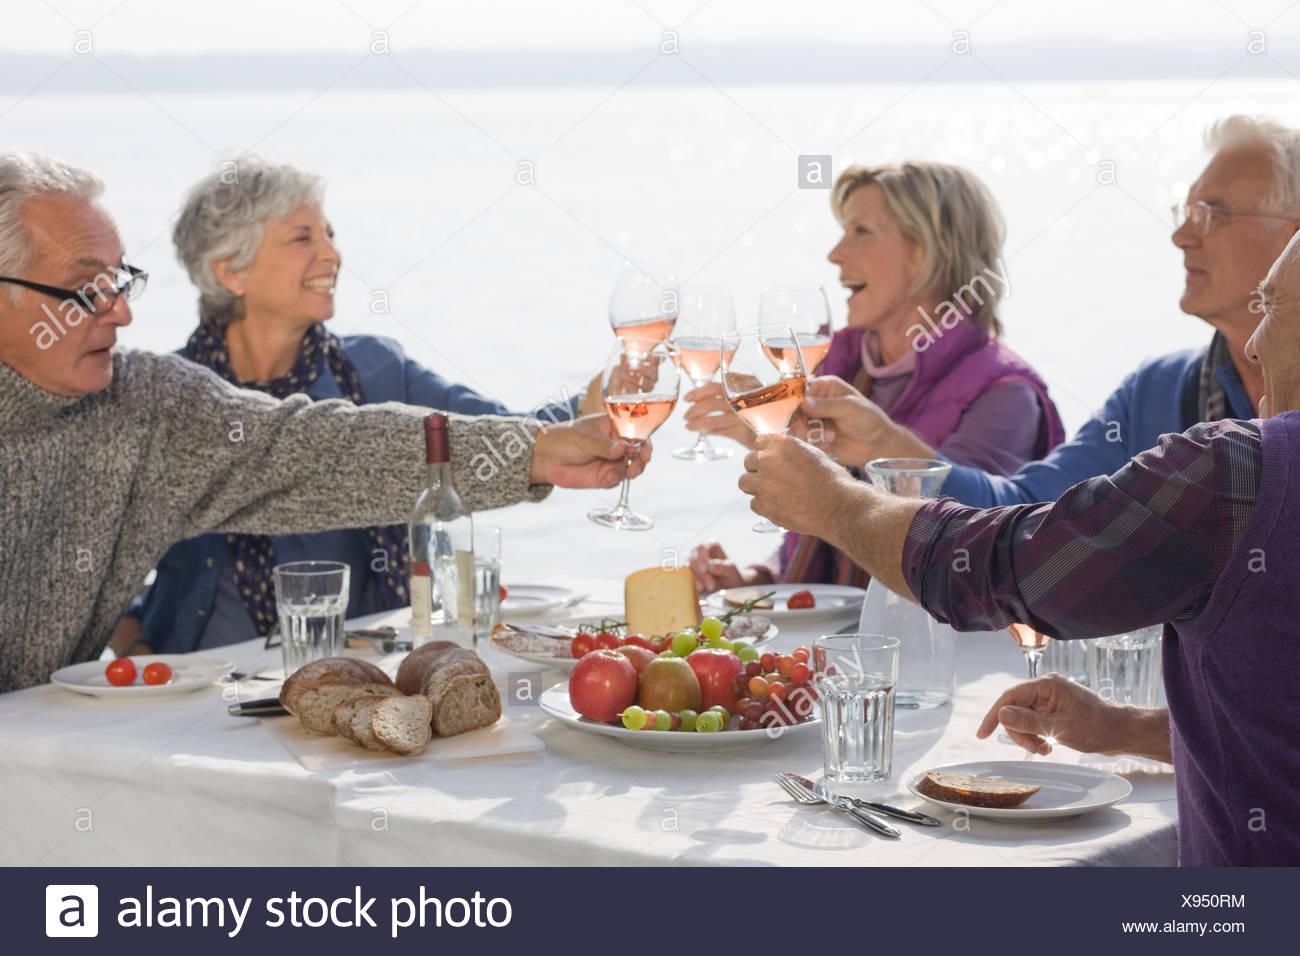 Five senior friends having lunch, raising their glasses - Stock Image